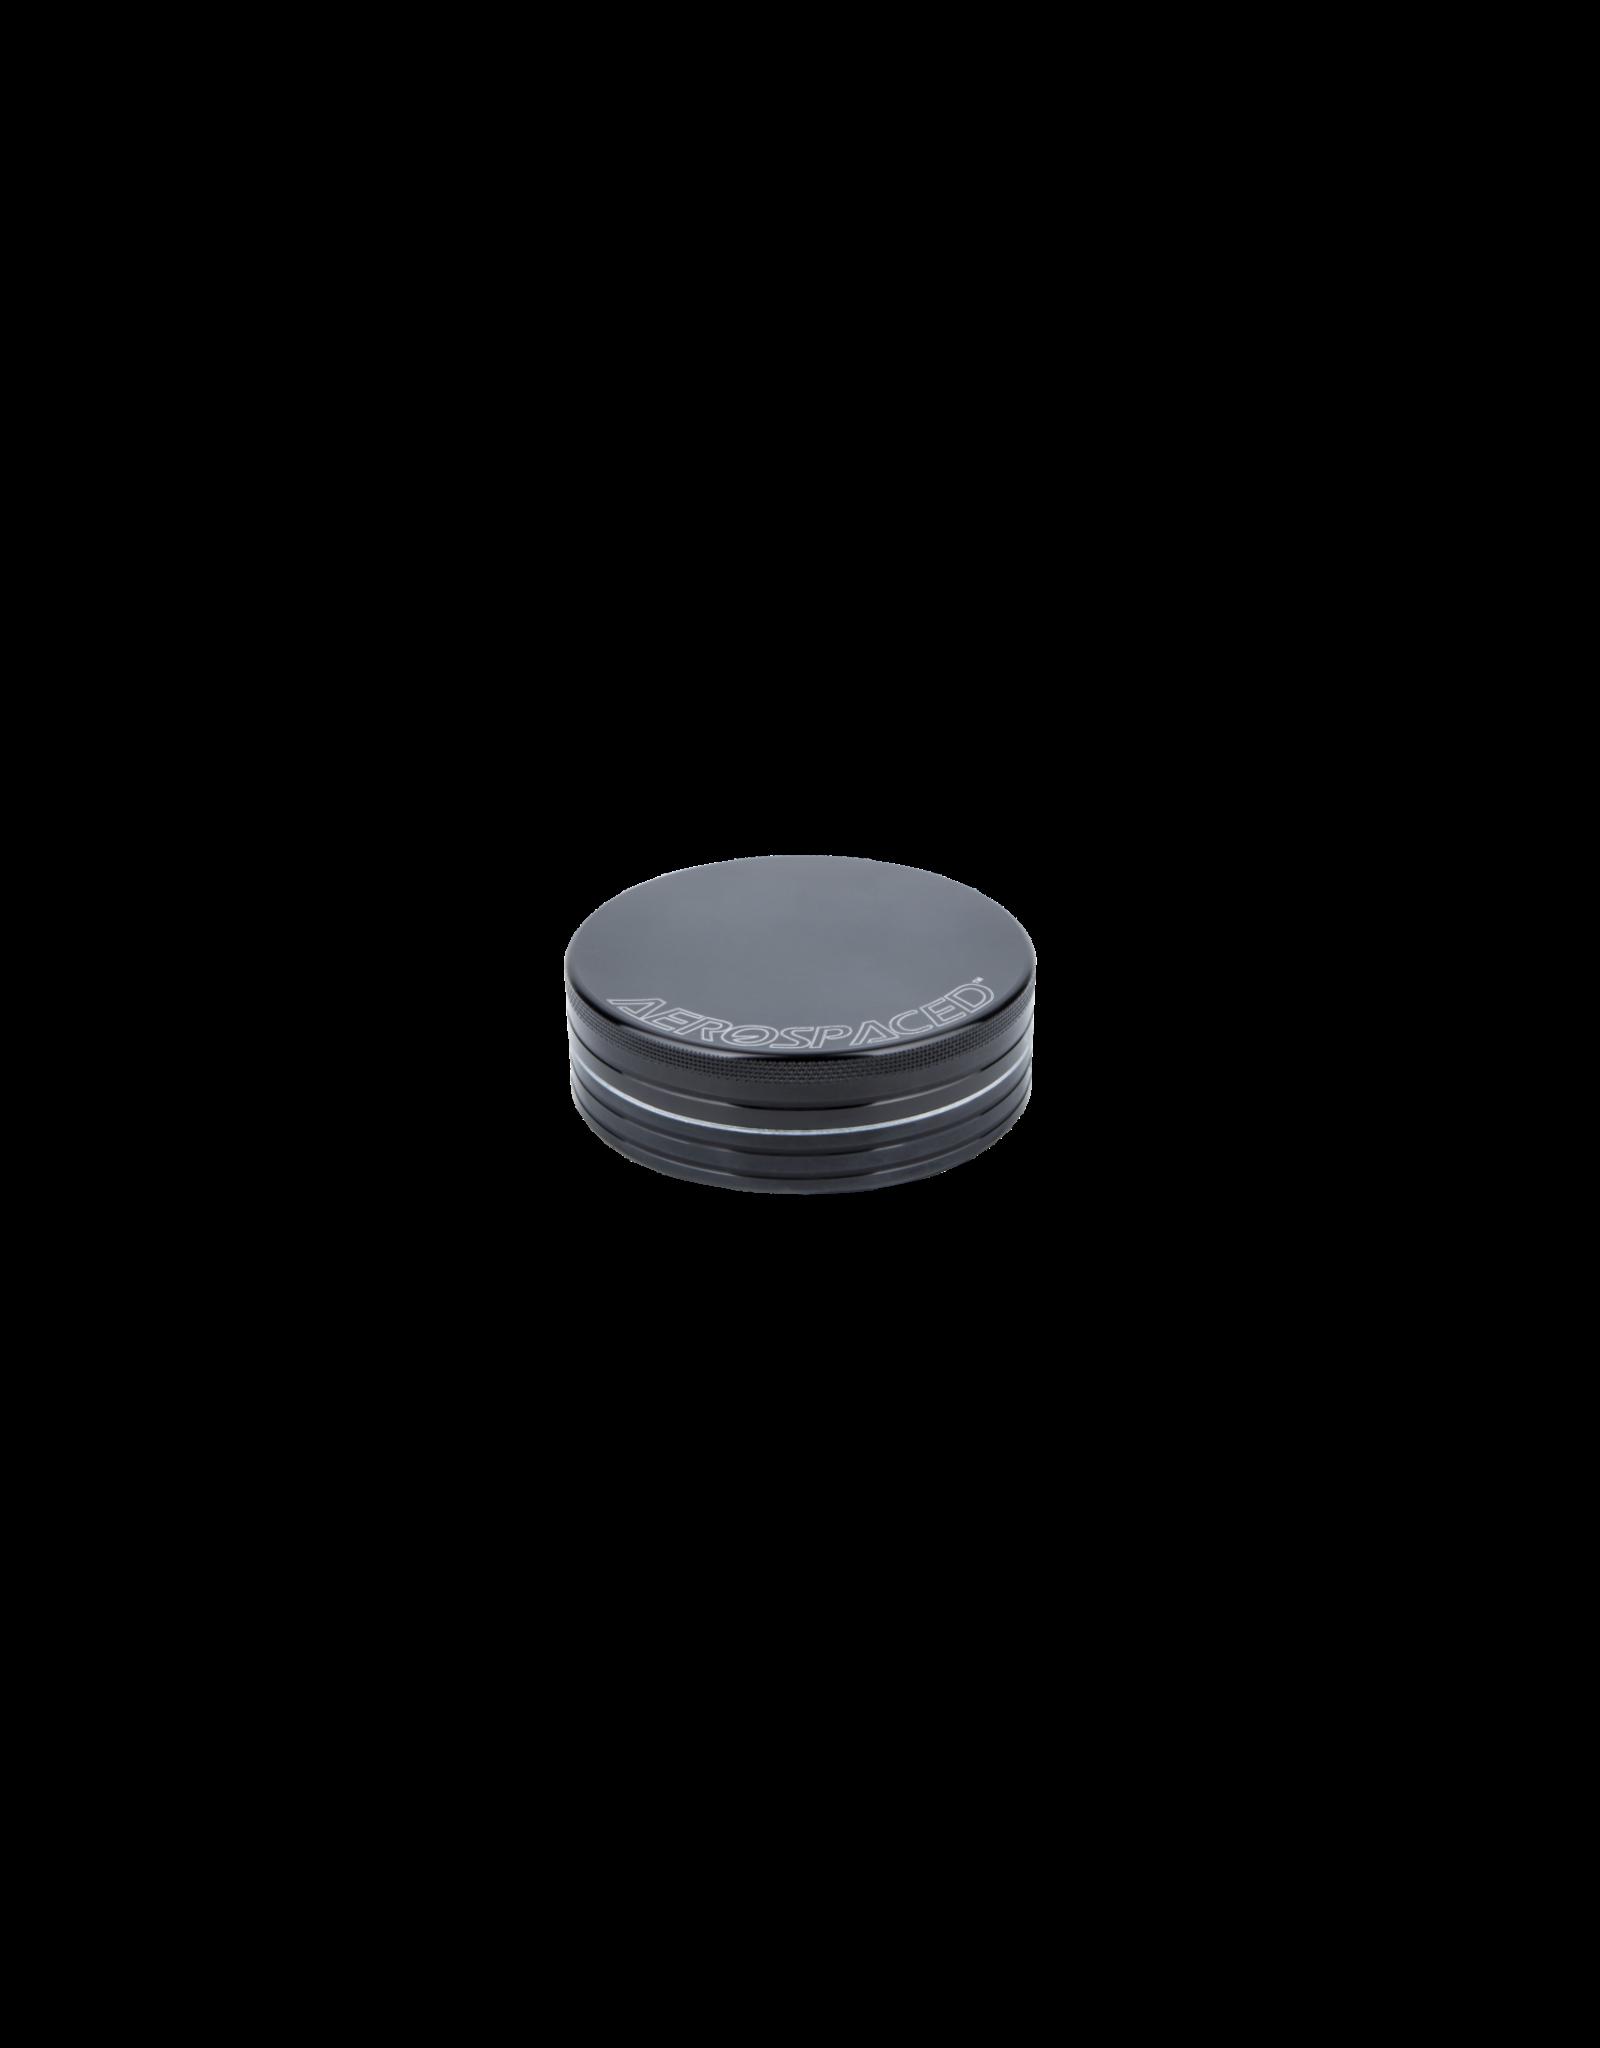 Aerospaced Grinder 50mm (2 parts) Black